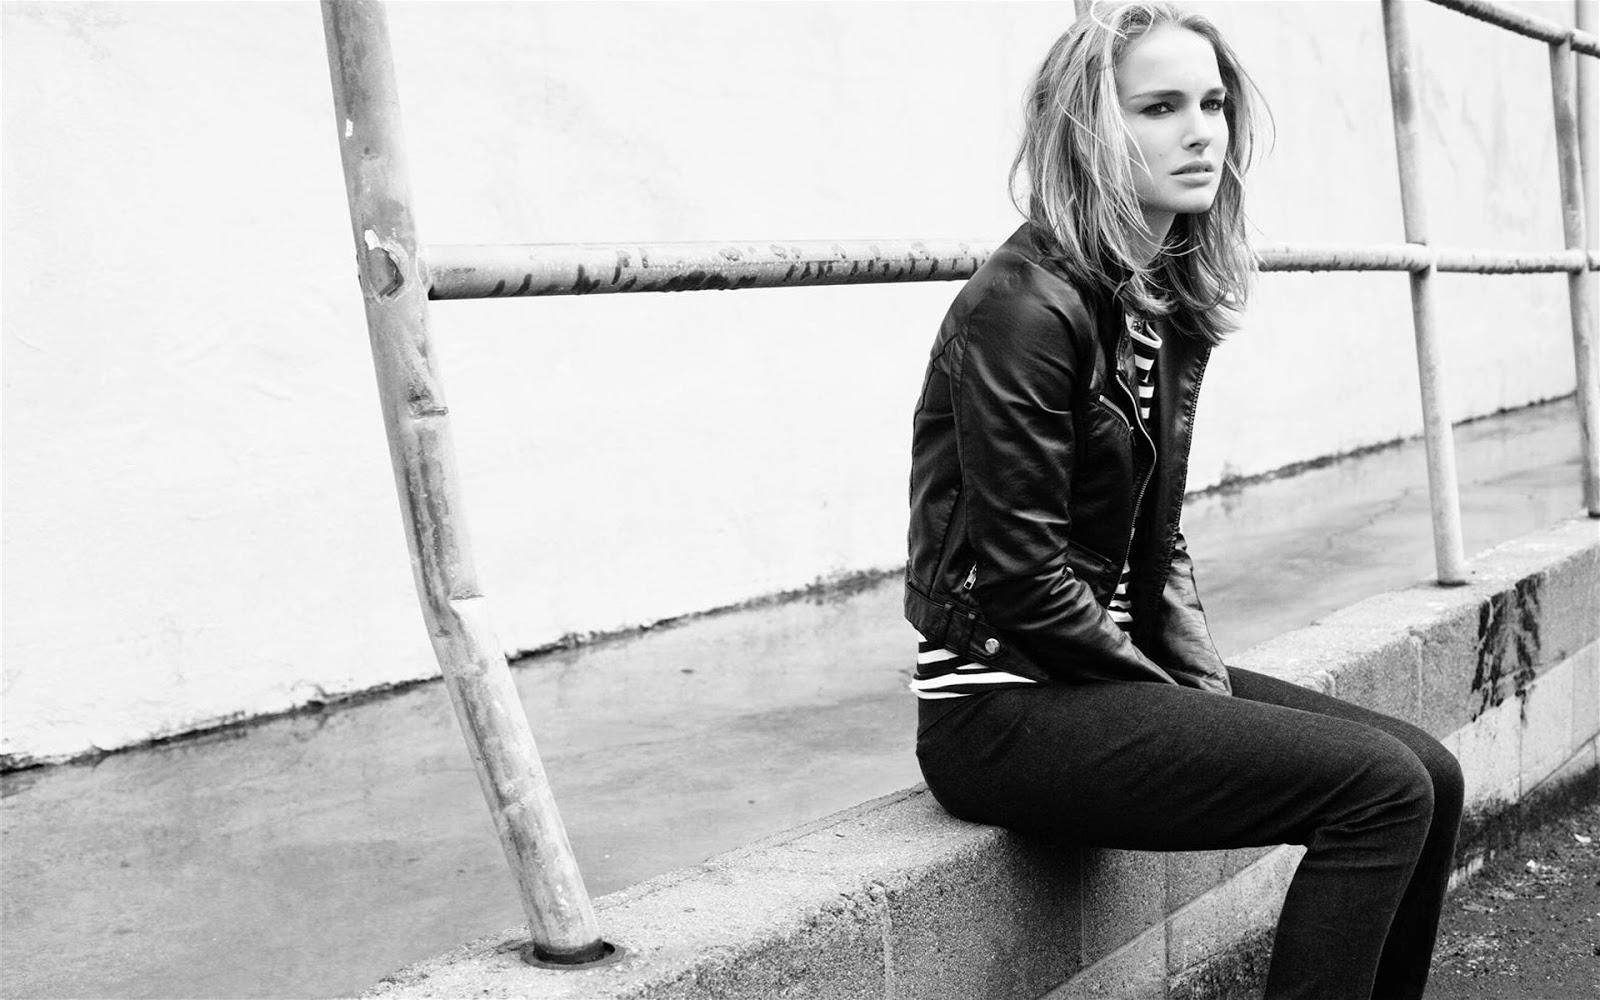 Natalie Portman Black and White Image